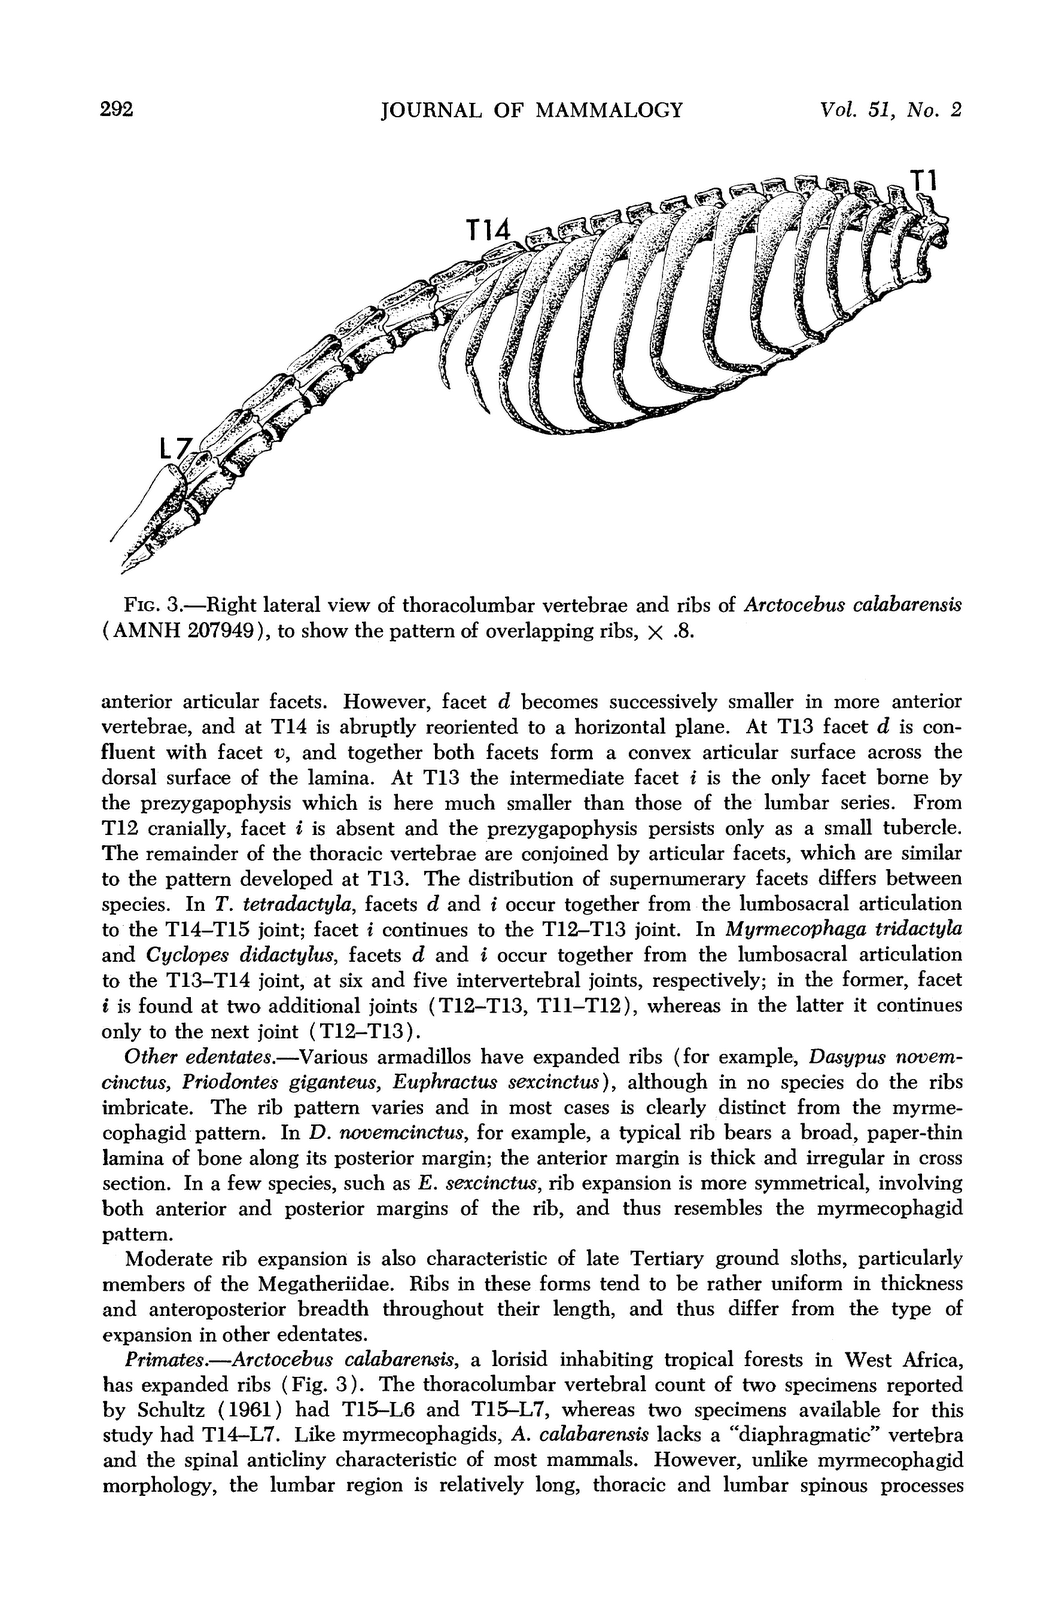 Anatomy of expanded Ribs | Tamandua Research